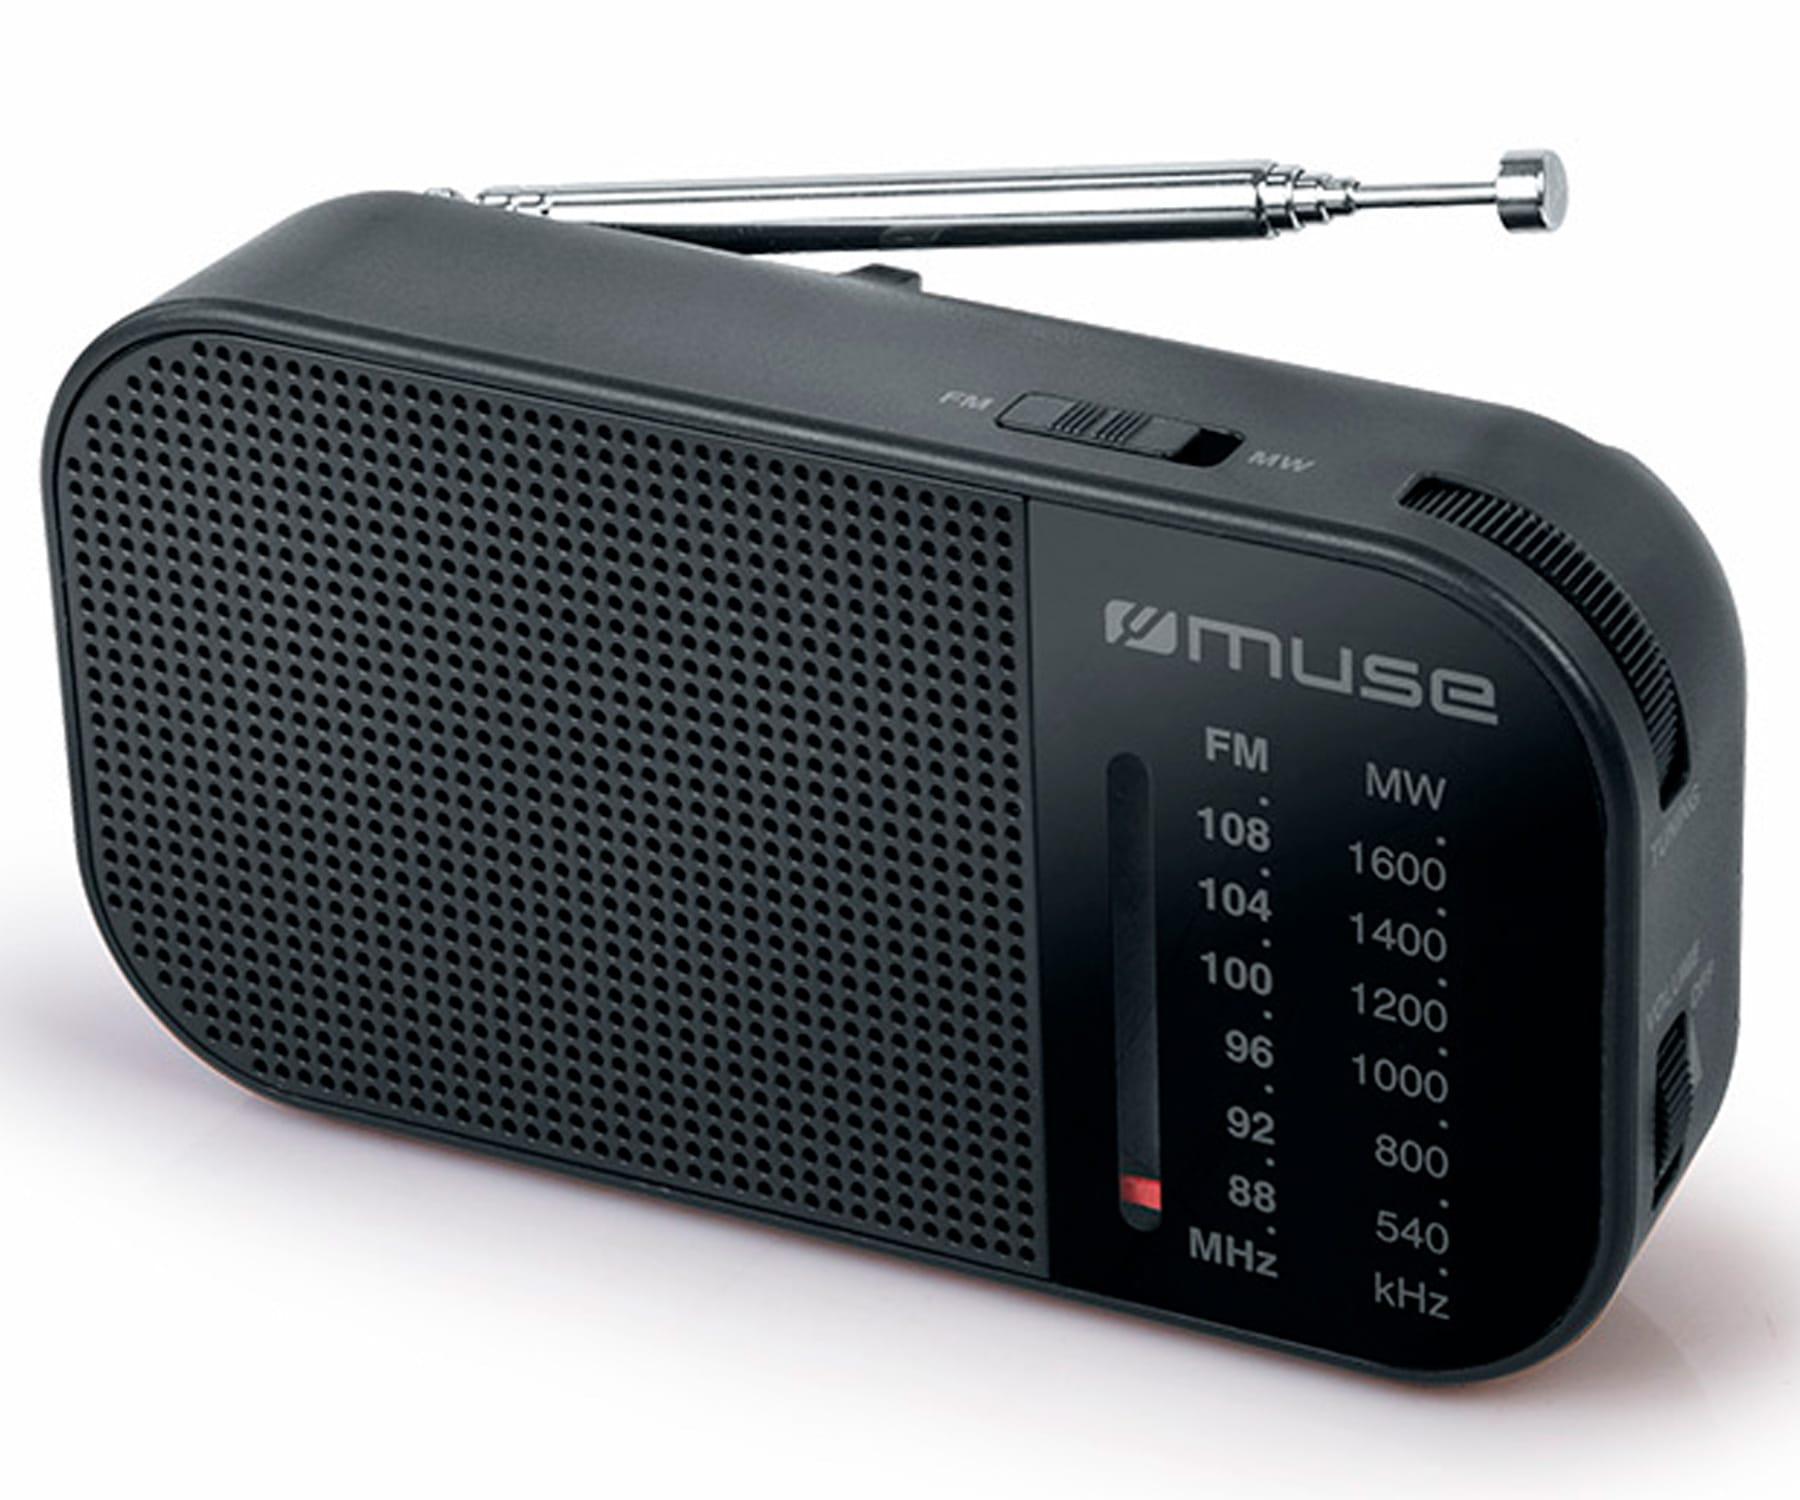 MUSE M-025 R NEGRO RADIO ANALÓGICA AM/FM PORTÁTIL CON ALTAVOZ INTEGRADO